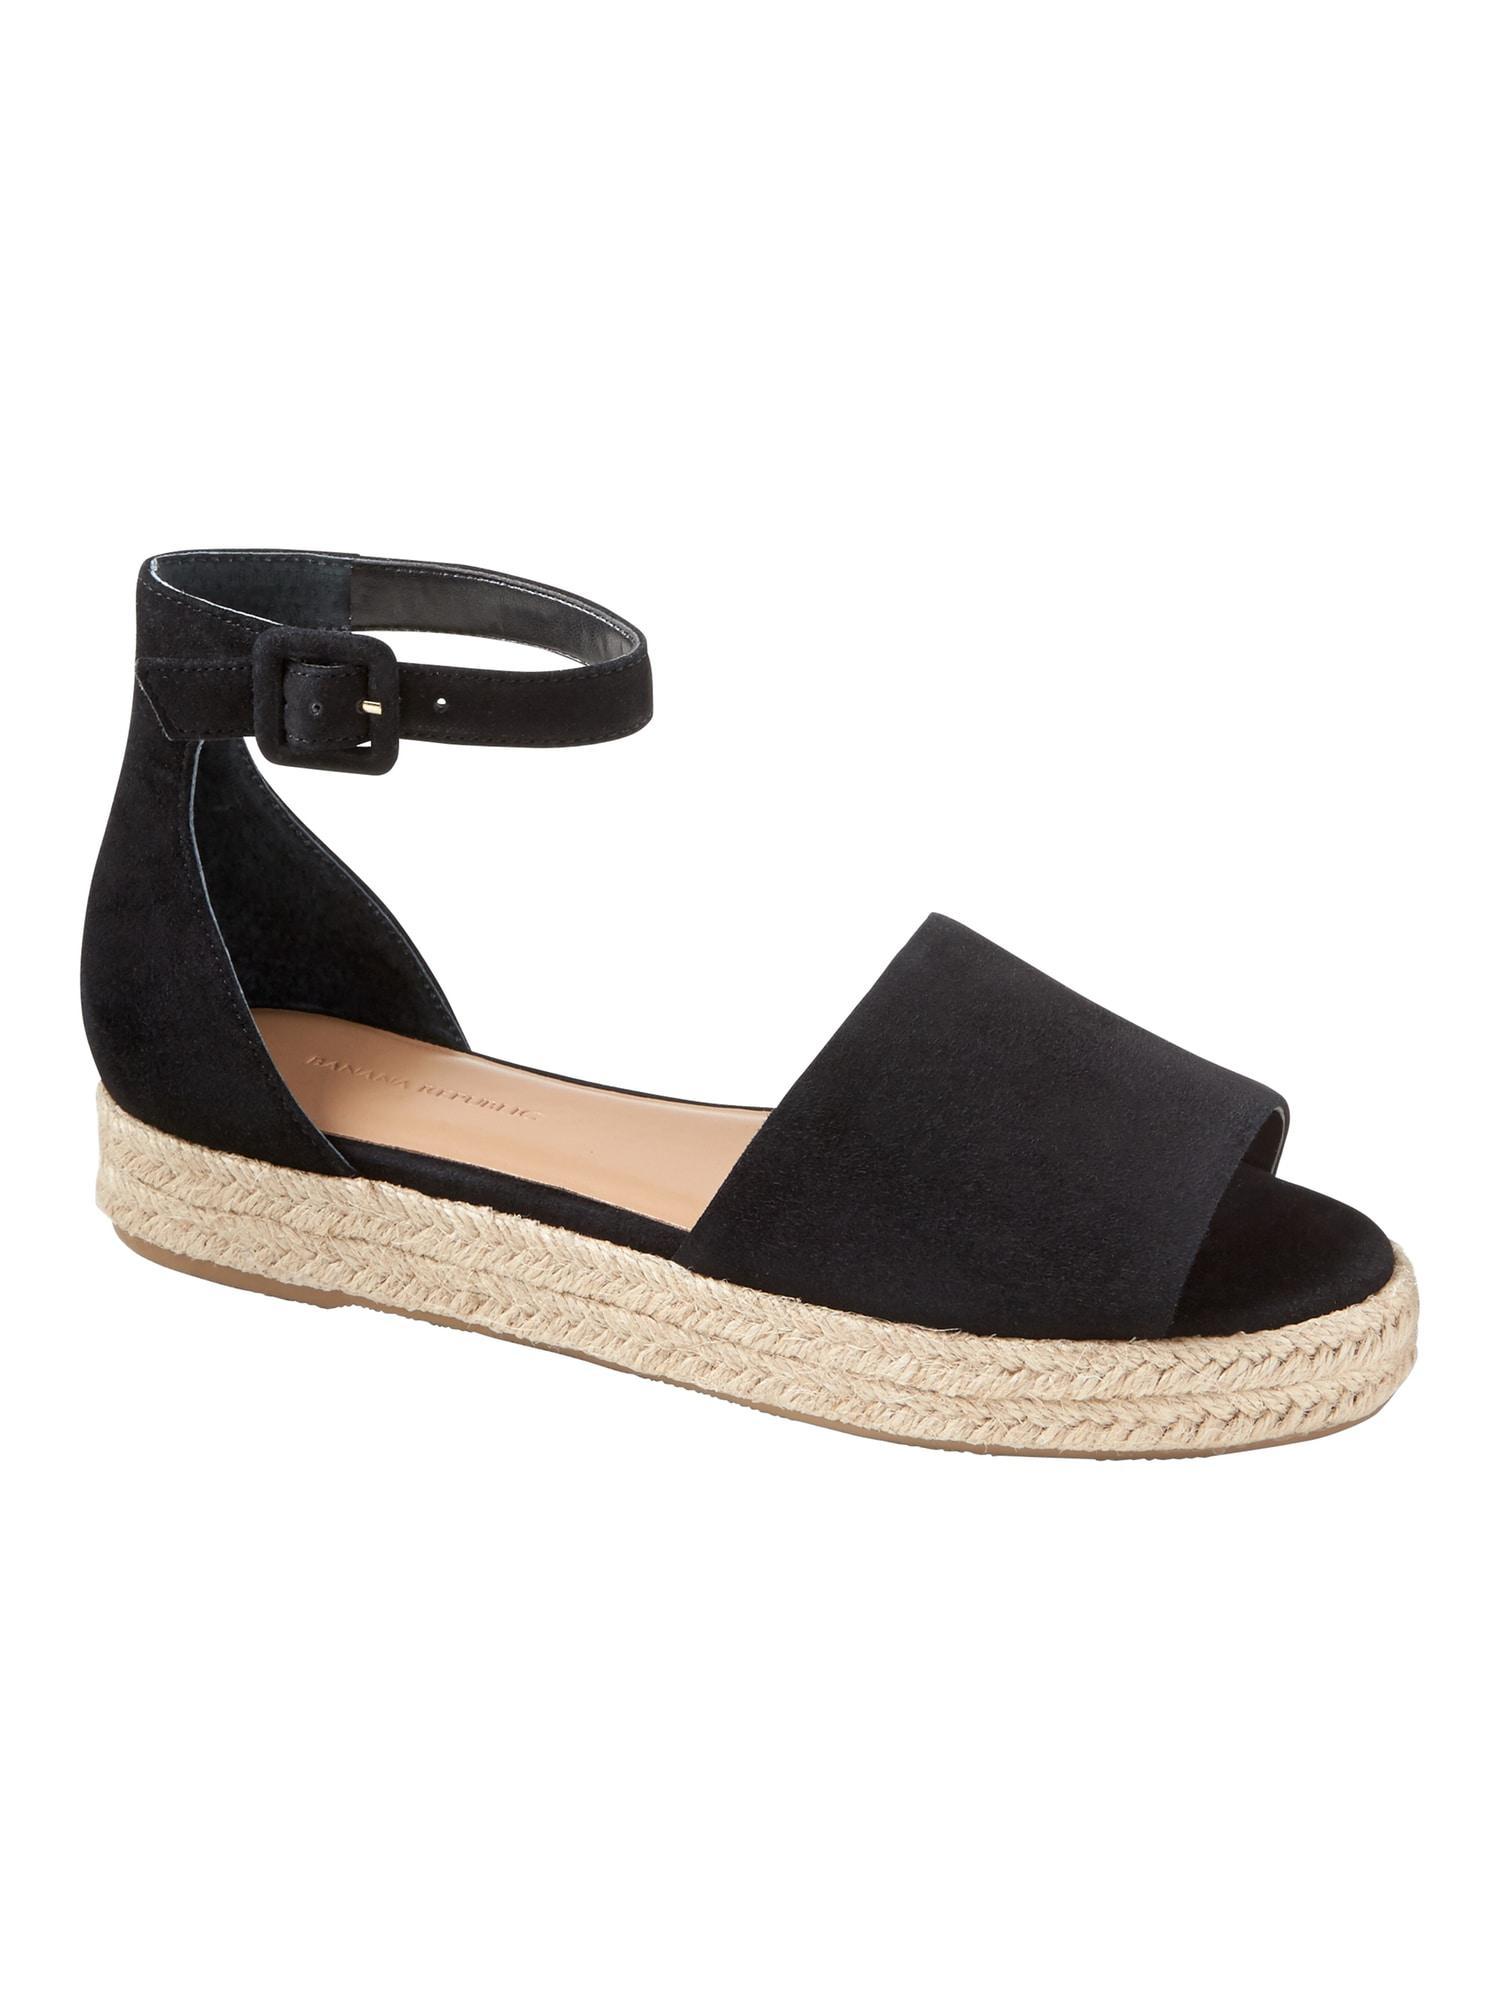 482eca21ea7 Lyst - Banana Republic Peep-toe Flatform Espadrille Sandal in Black